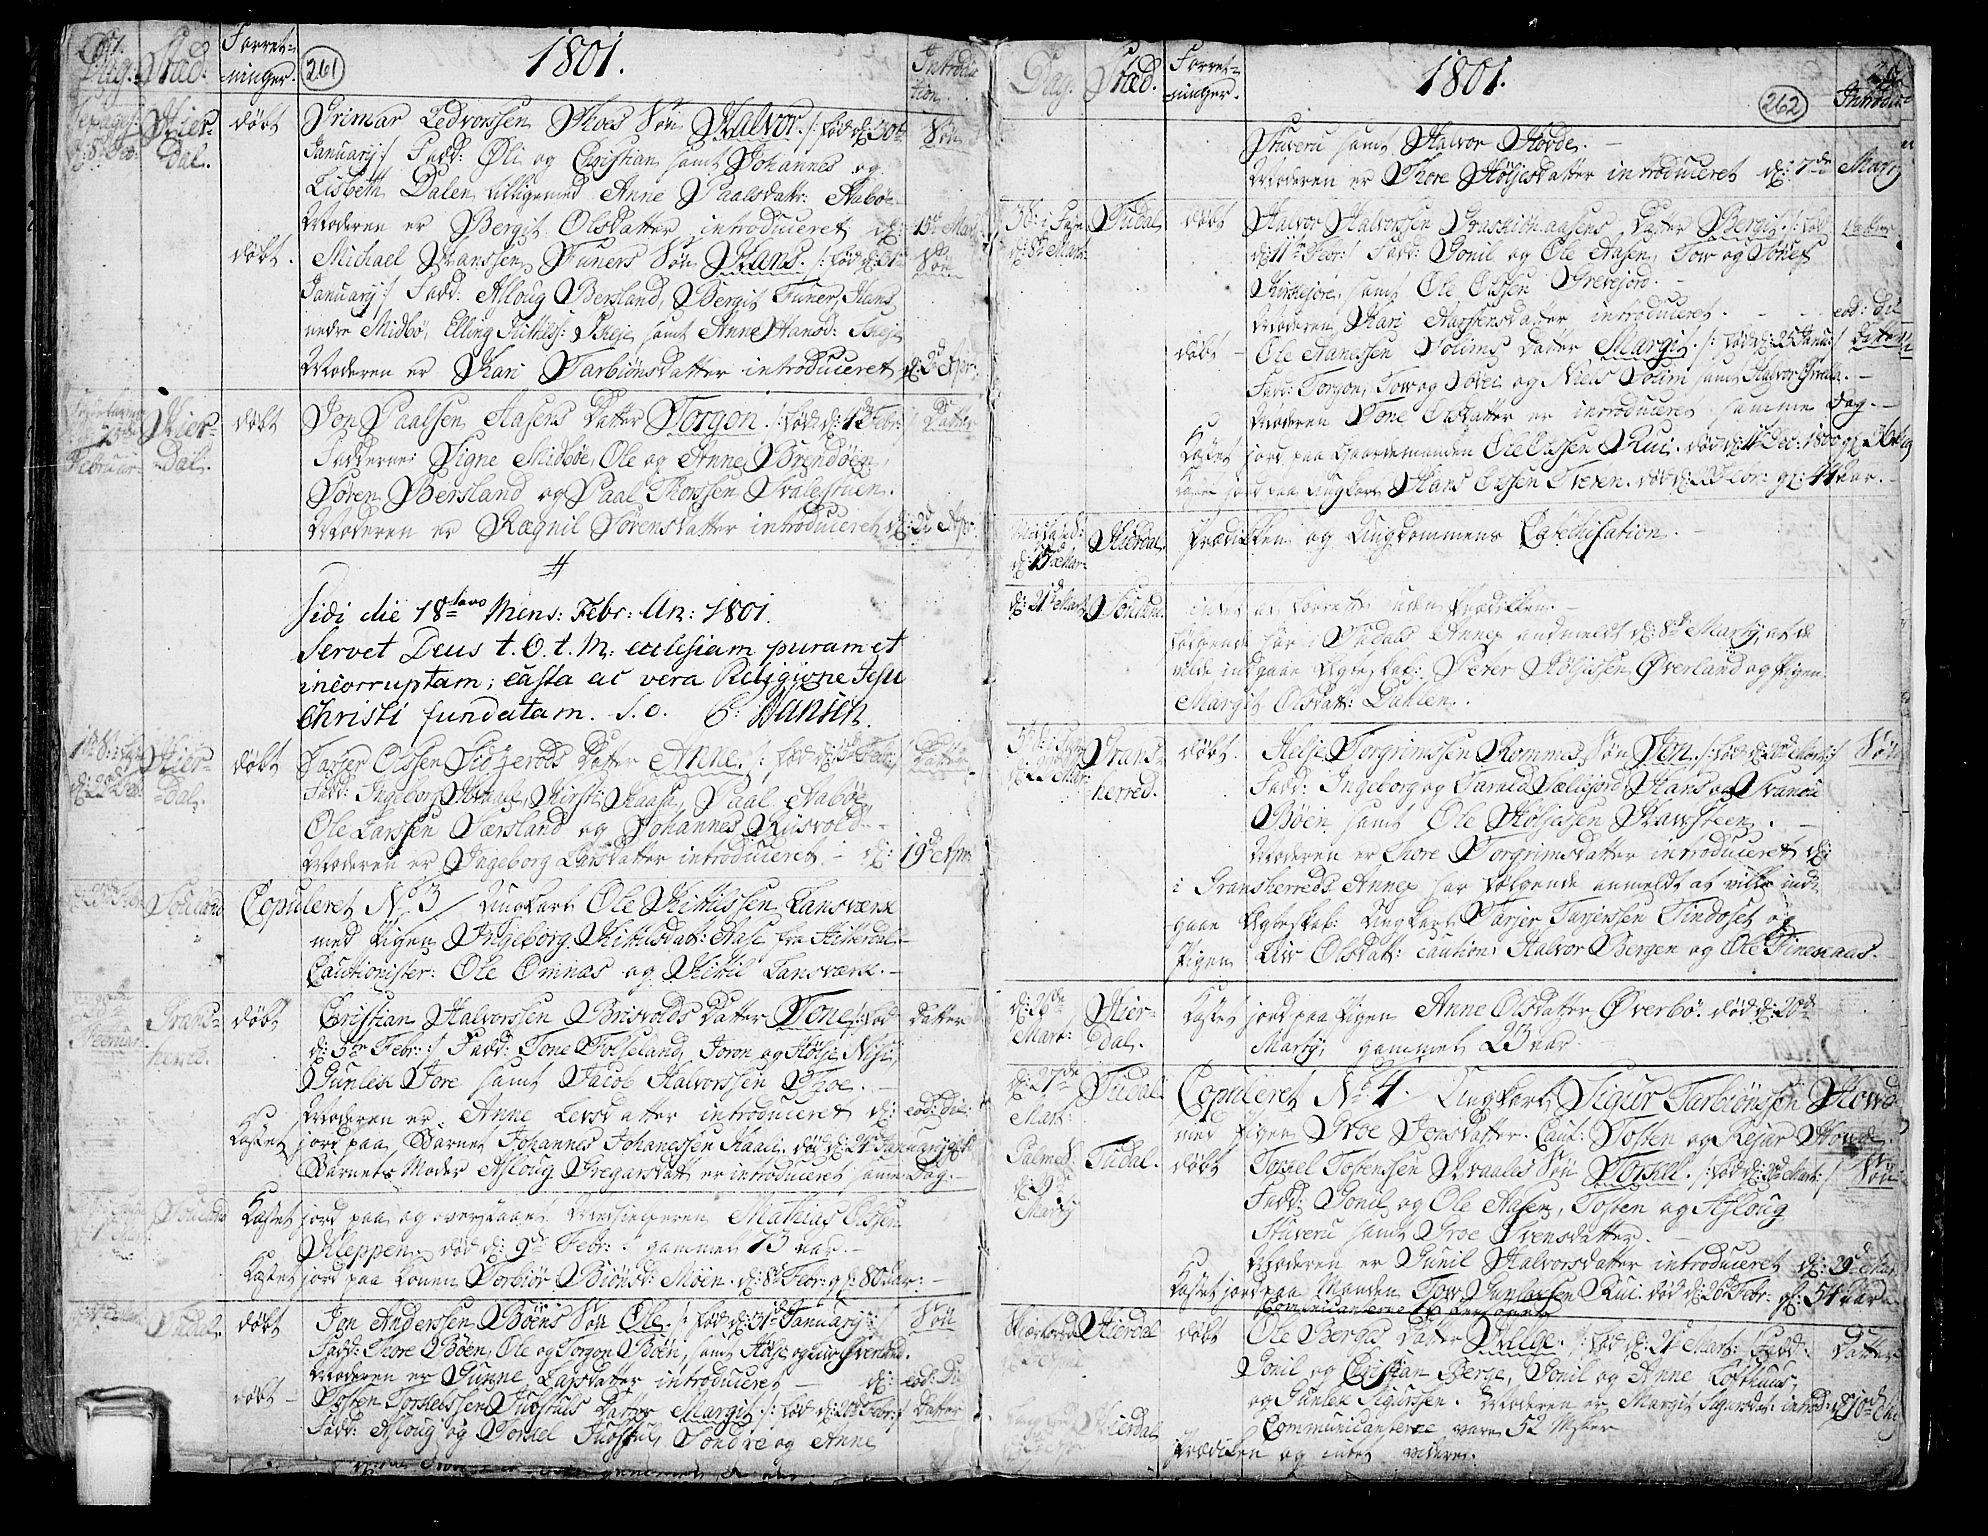 SAKO, Hjartdal kirkebøker, F/Fa/L0005: Ministerialbok nr. I 5, 1776-1801, s. 261-262